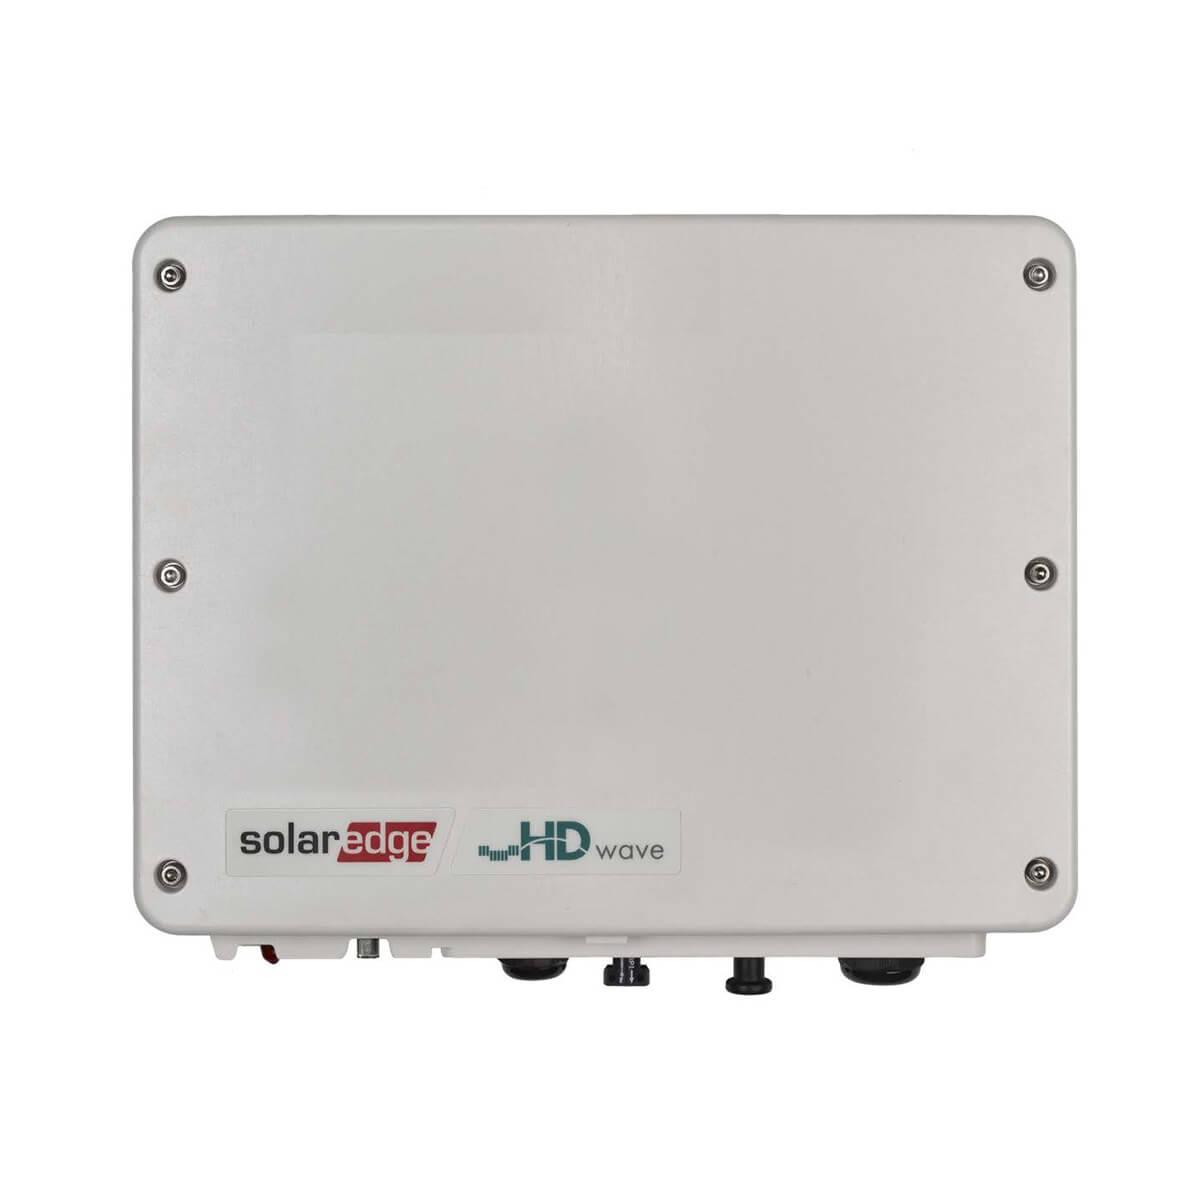 solaredge 3.6kW inverter, solaredge se3680h 3.6kW inverter, solaredge se3680h inverter, solaredge se3680h, solaredge 3.6 kW, SOLAREDGE 3.6 KW